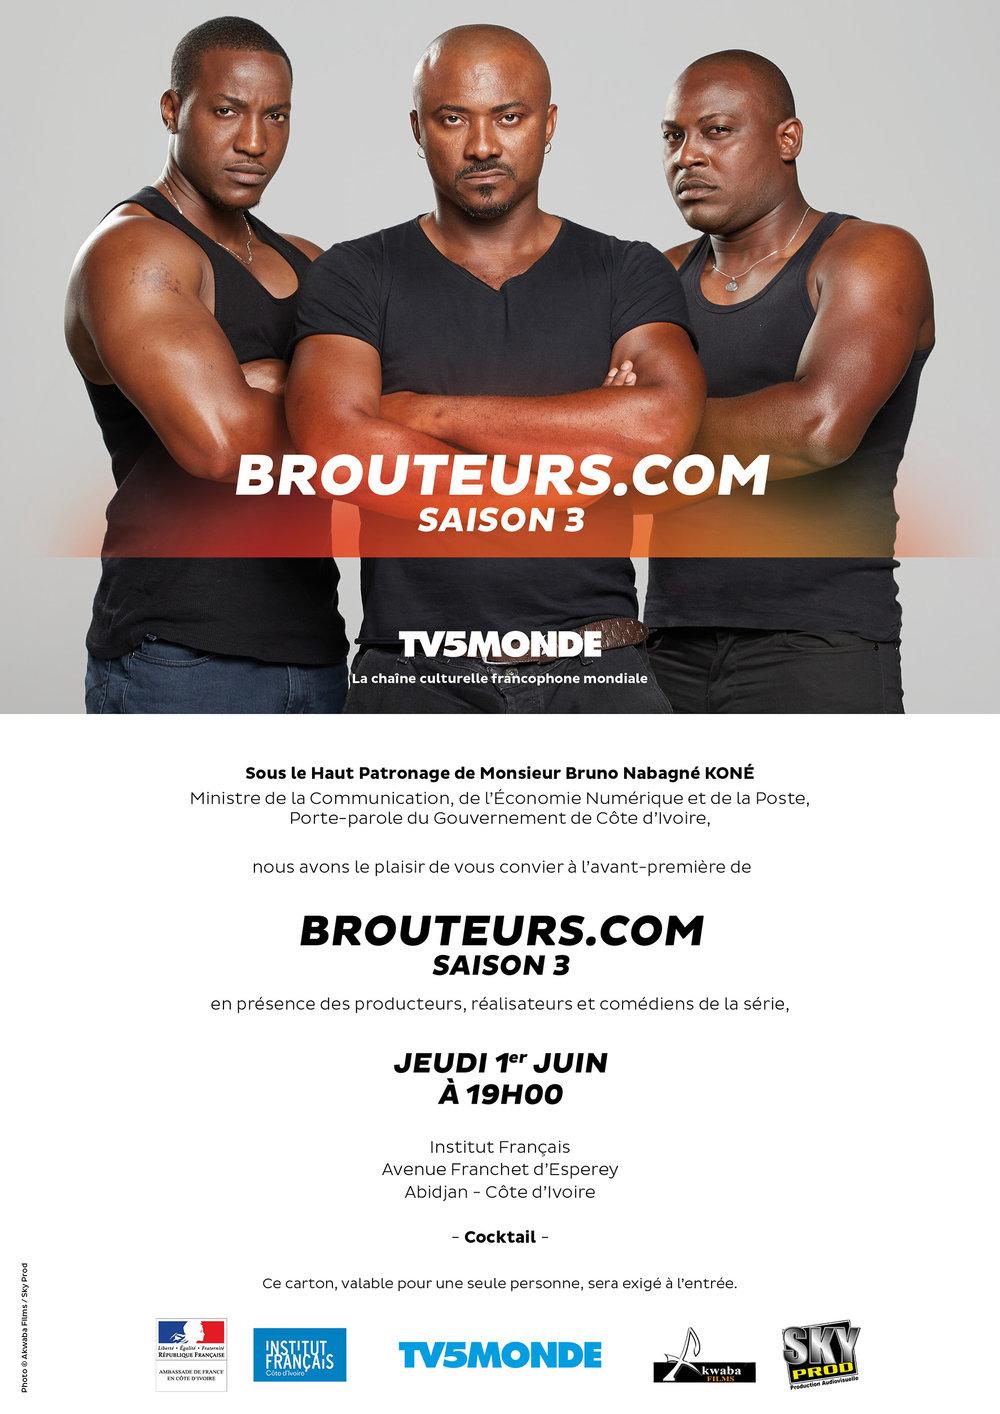 Invitation Brouteurs.com S3.jpg